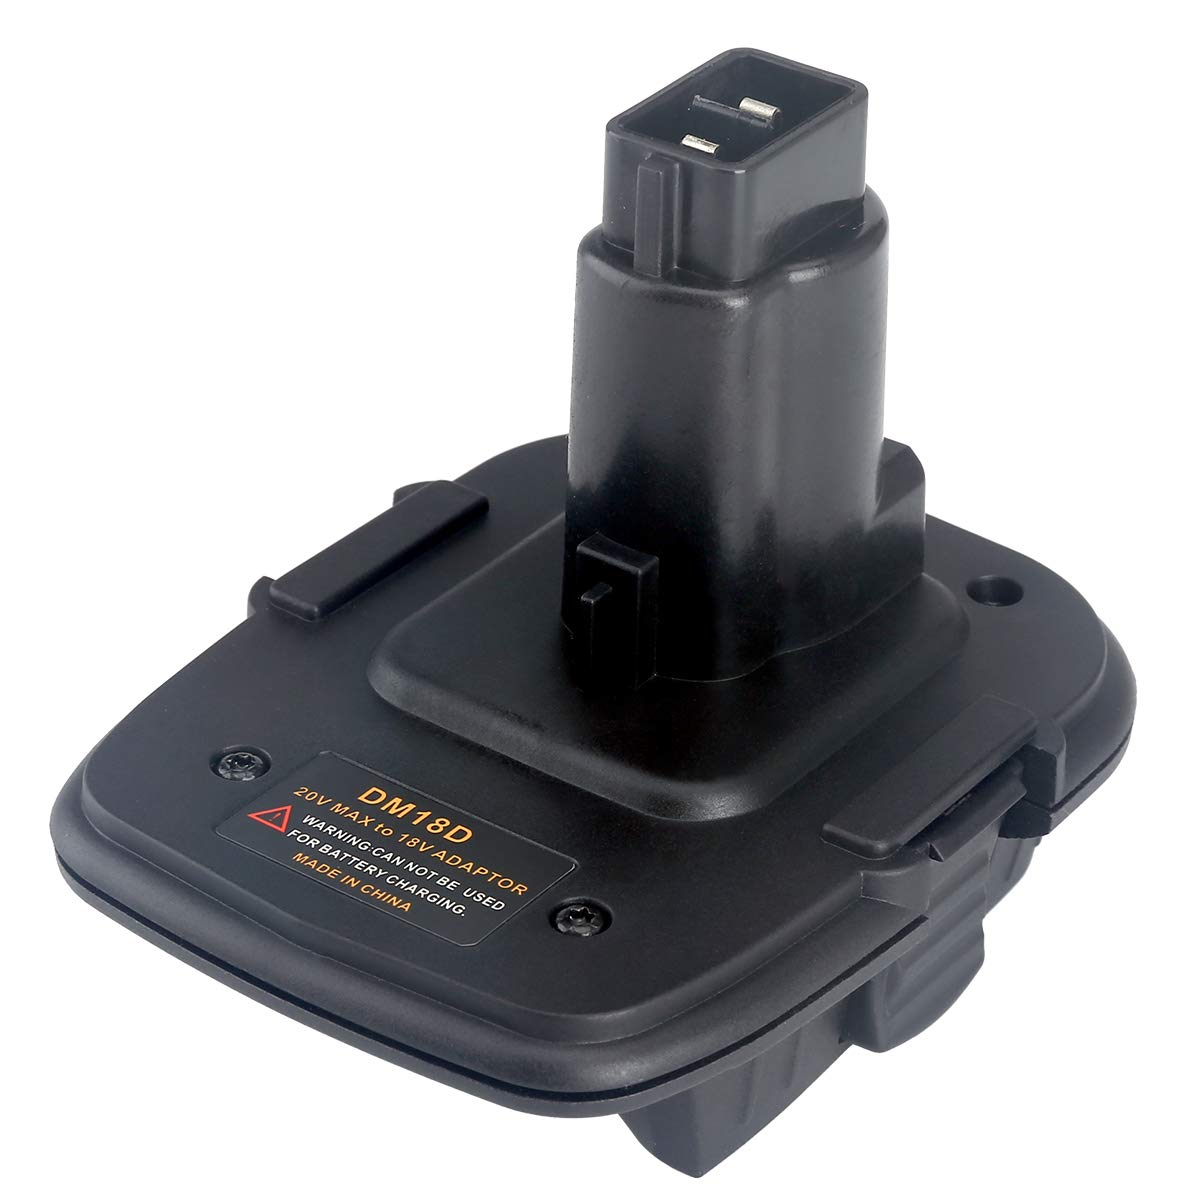 Battery Adapter for Dewalt DM18D Converter Milwaukee Battery to Dewalt Tools FHJ